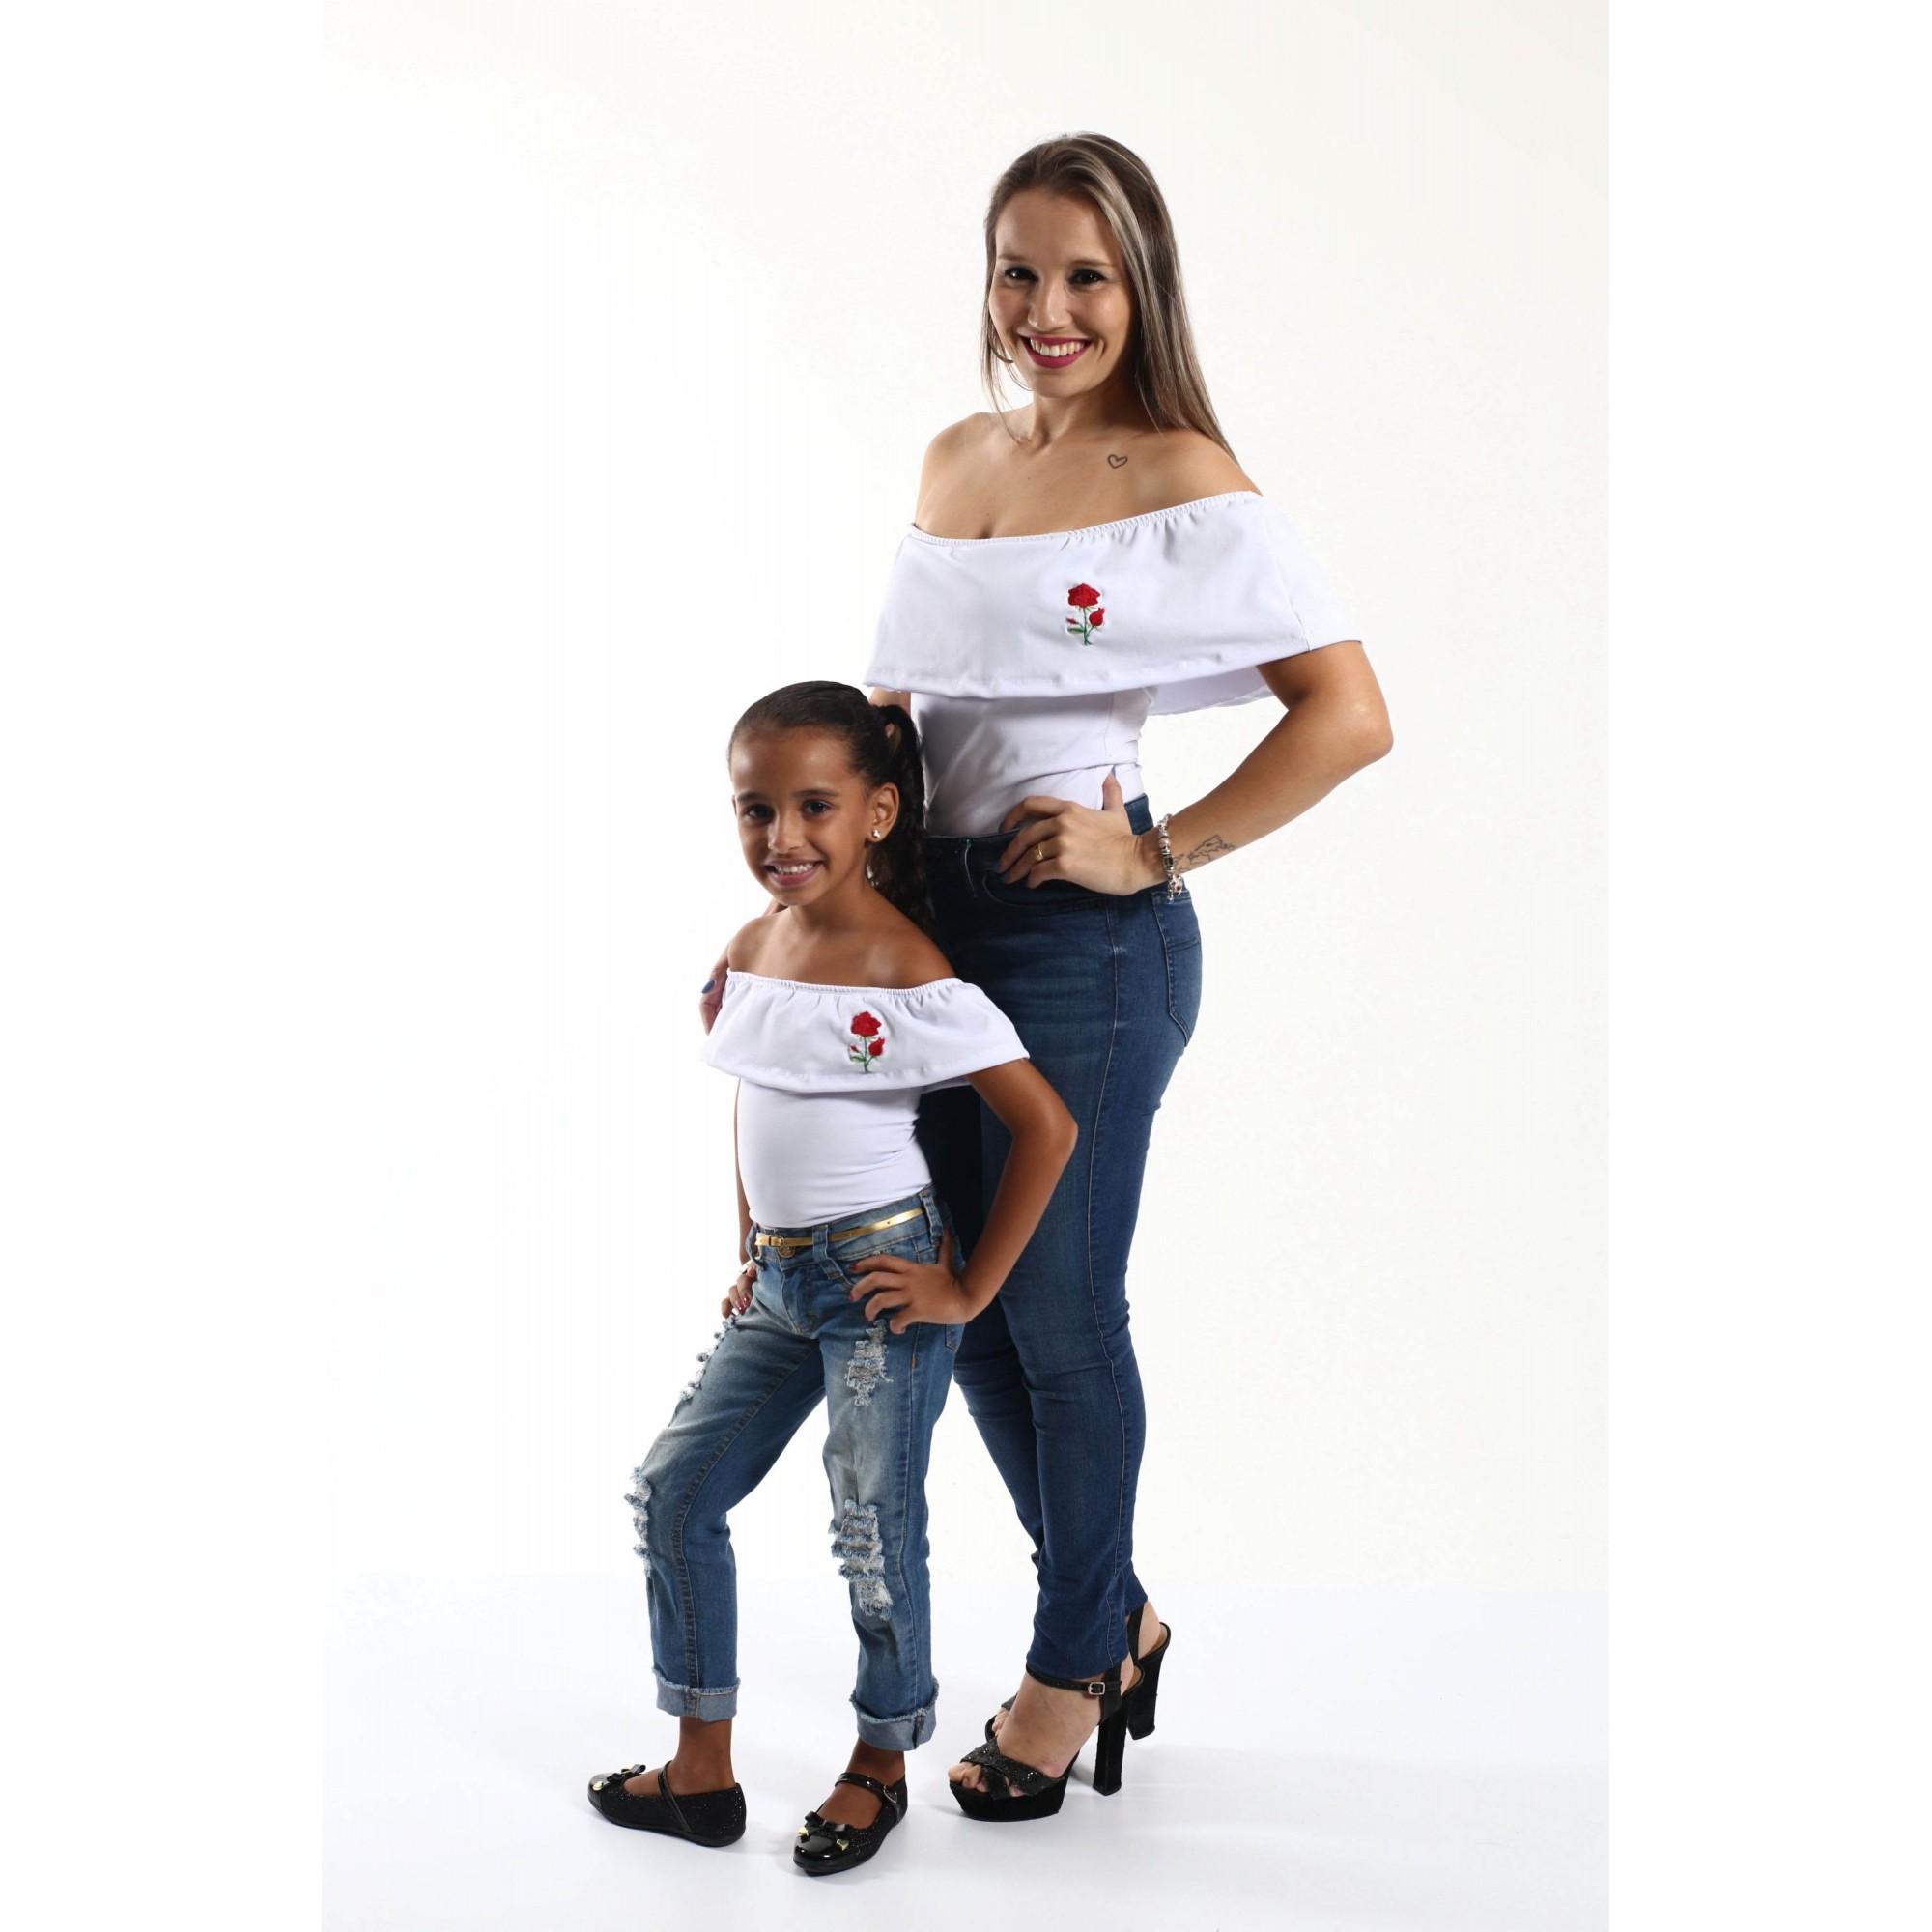 Mãe e Filha > Kit 02 Bodys Femininos Branco  [Coleção Tal Mãe Tal Filha]  - Heitor Fashion Brazil